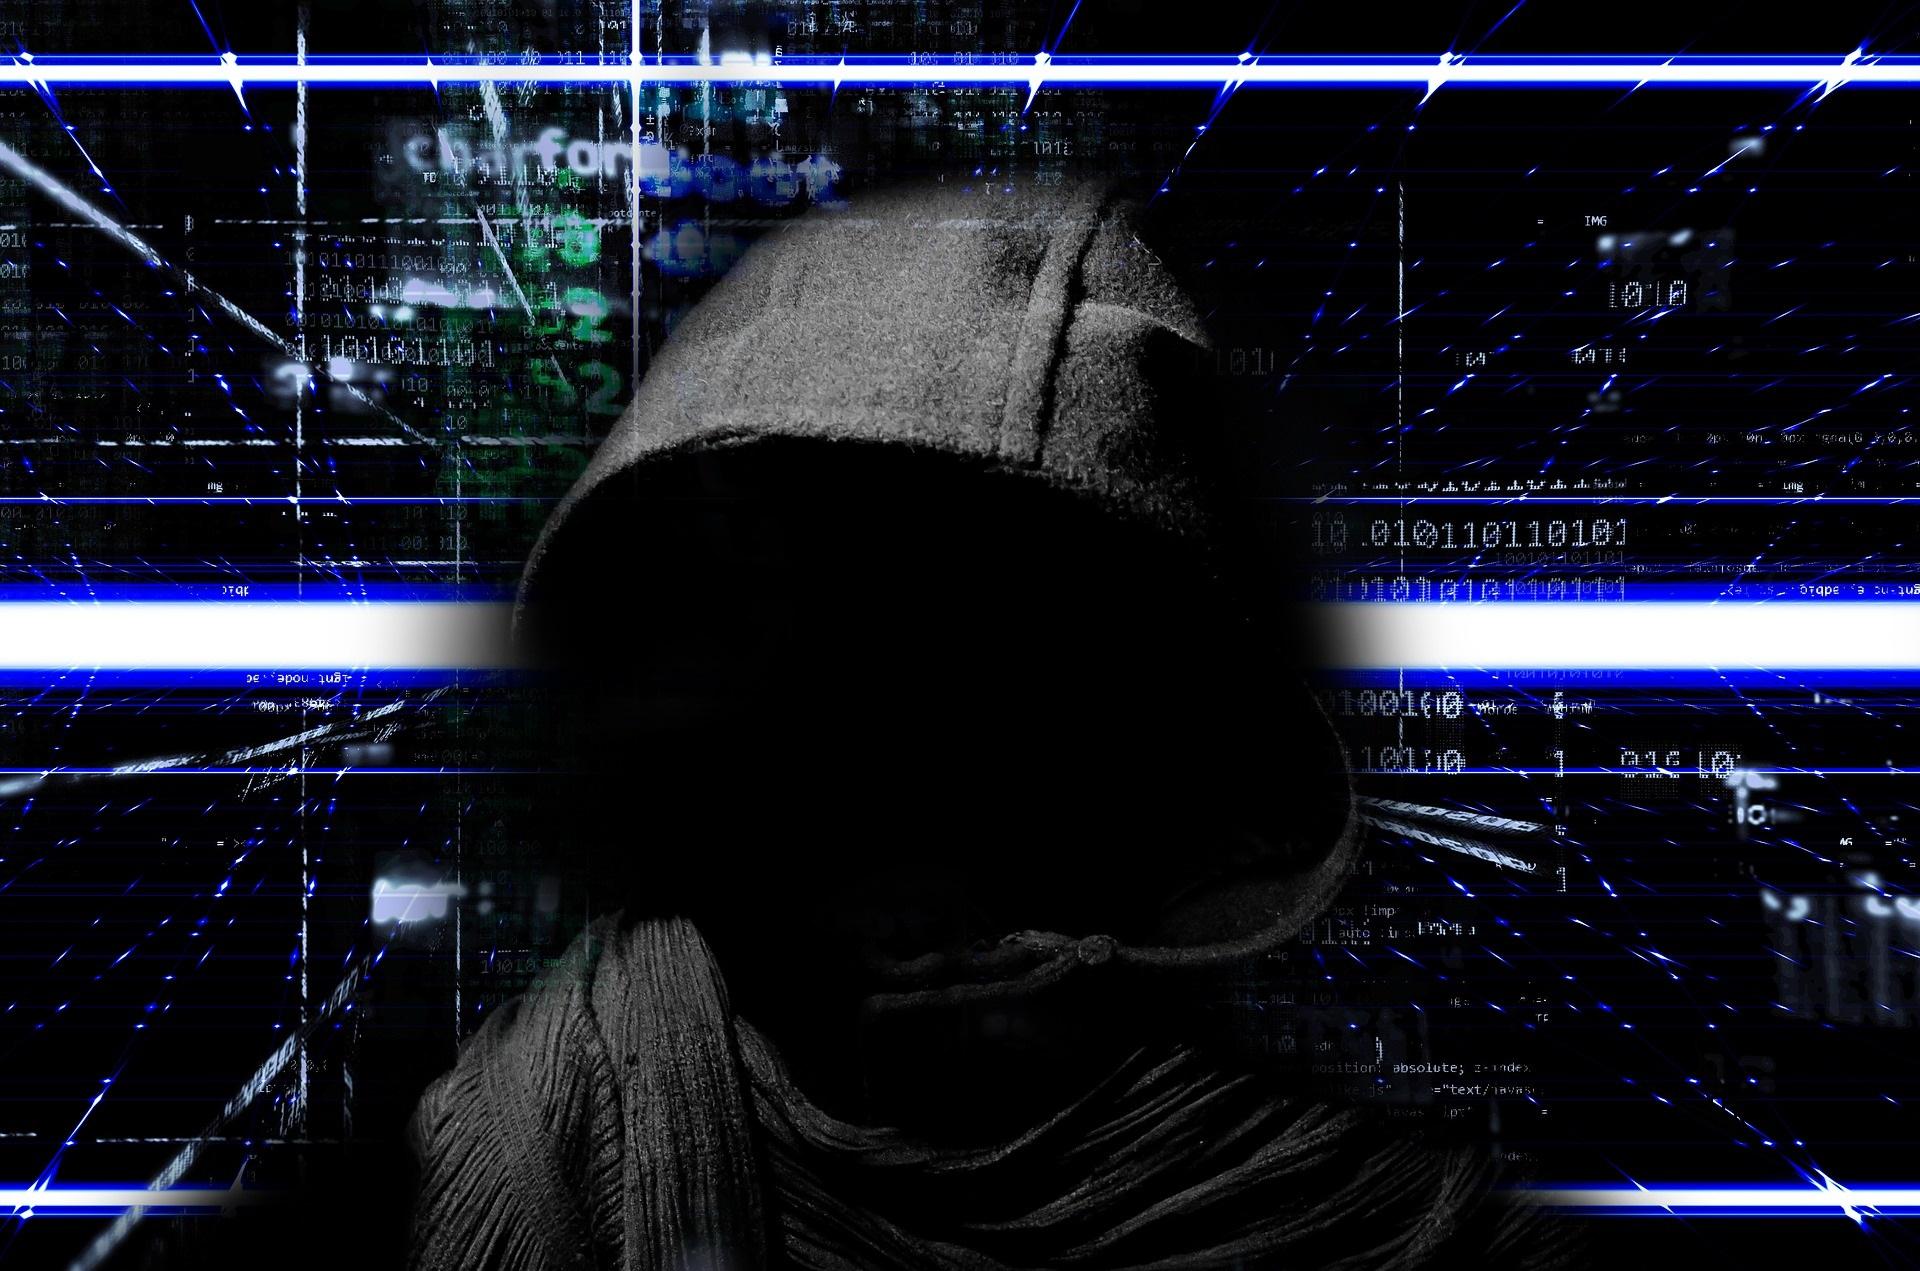 Developmnent security concerns